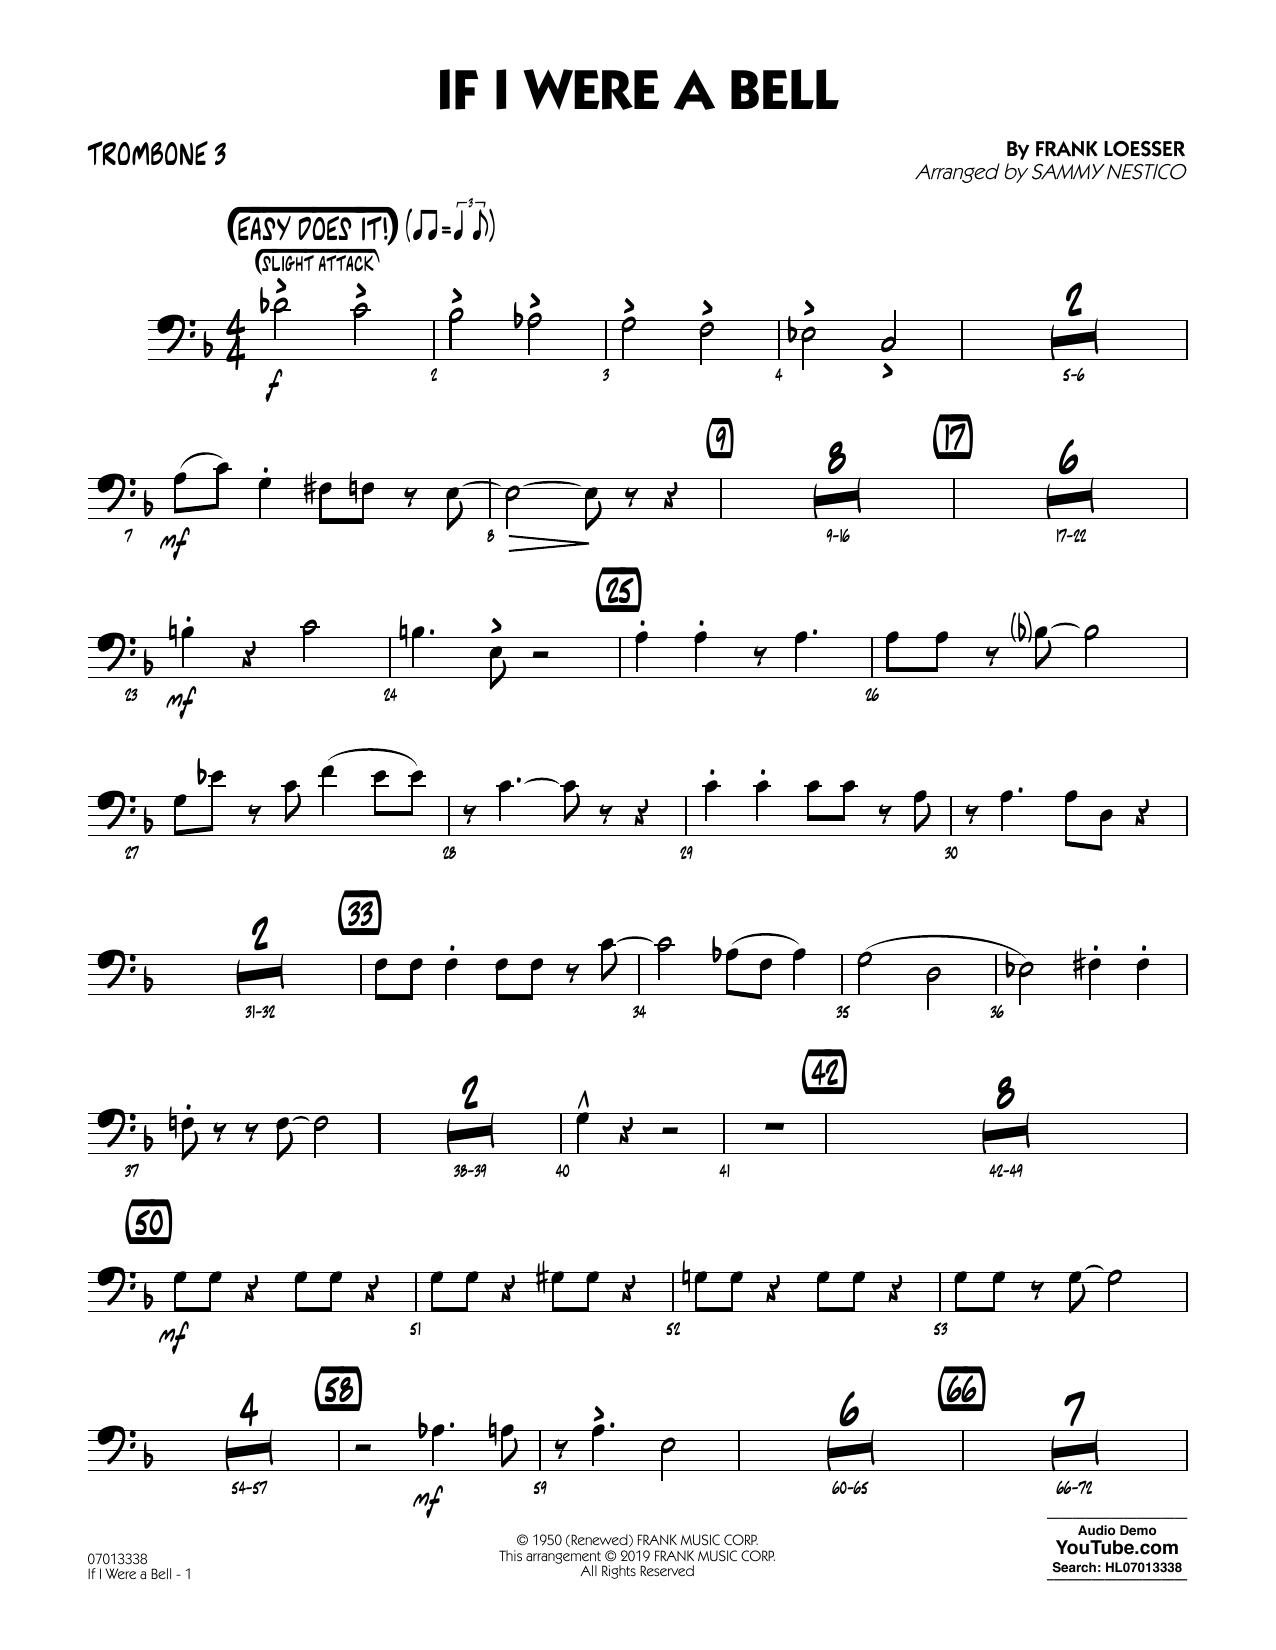 If I Were a Bell (arr. Sammy Nestico) - Trombone 3 (Jazz Ensemble)